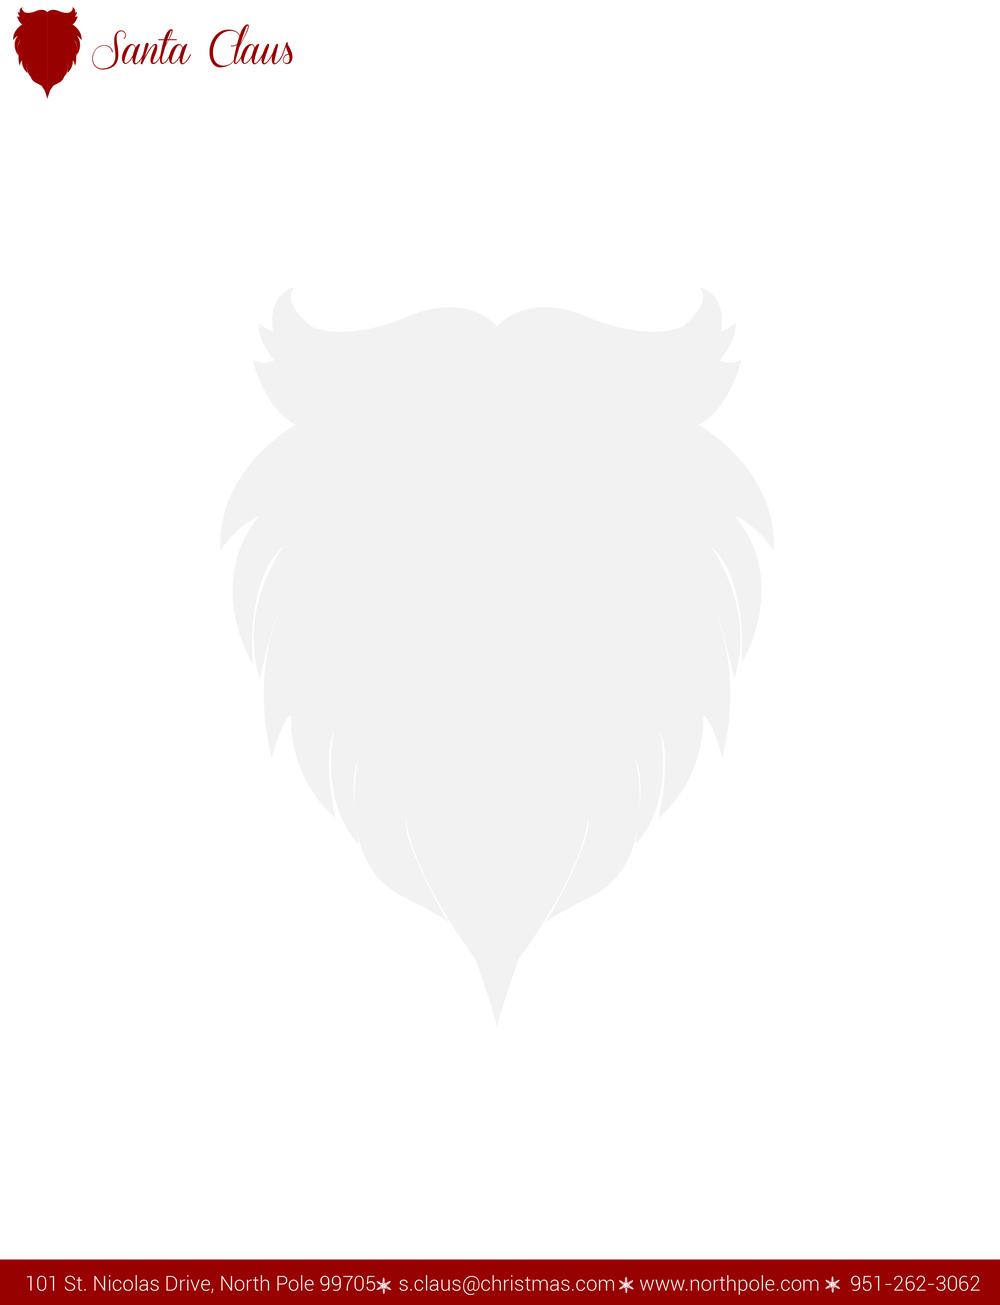 santa letterhead.jpg